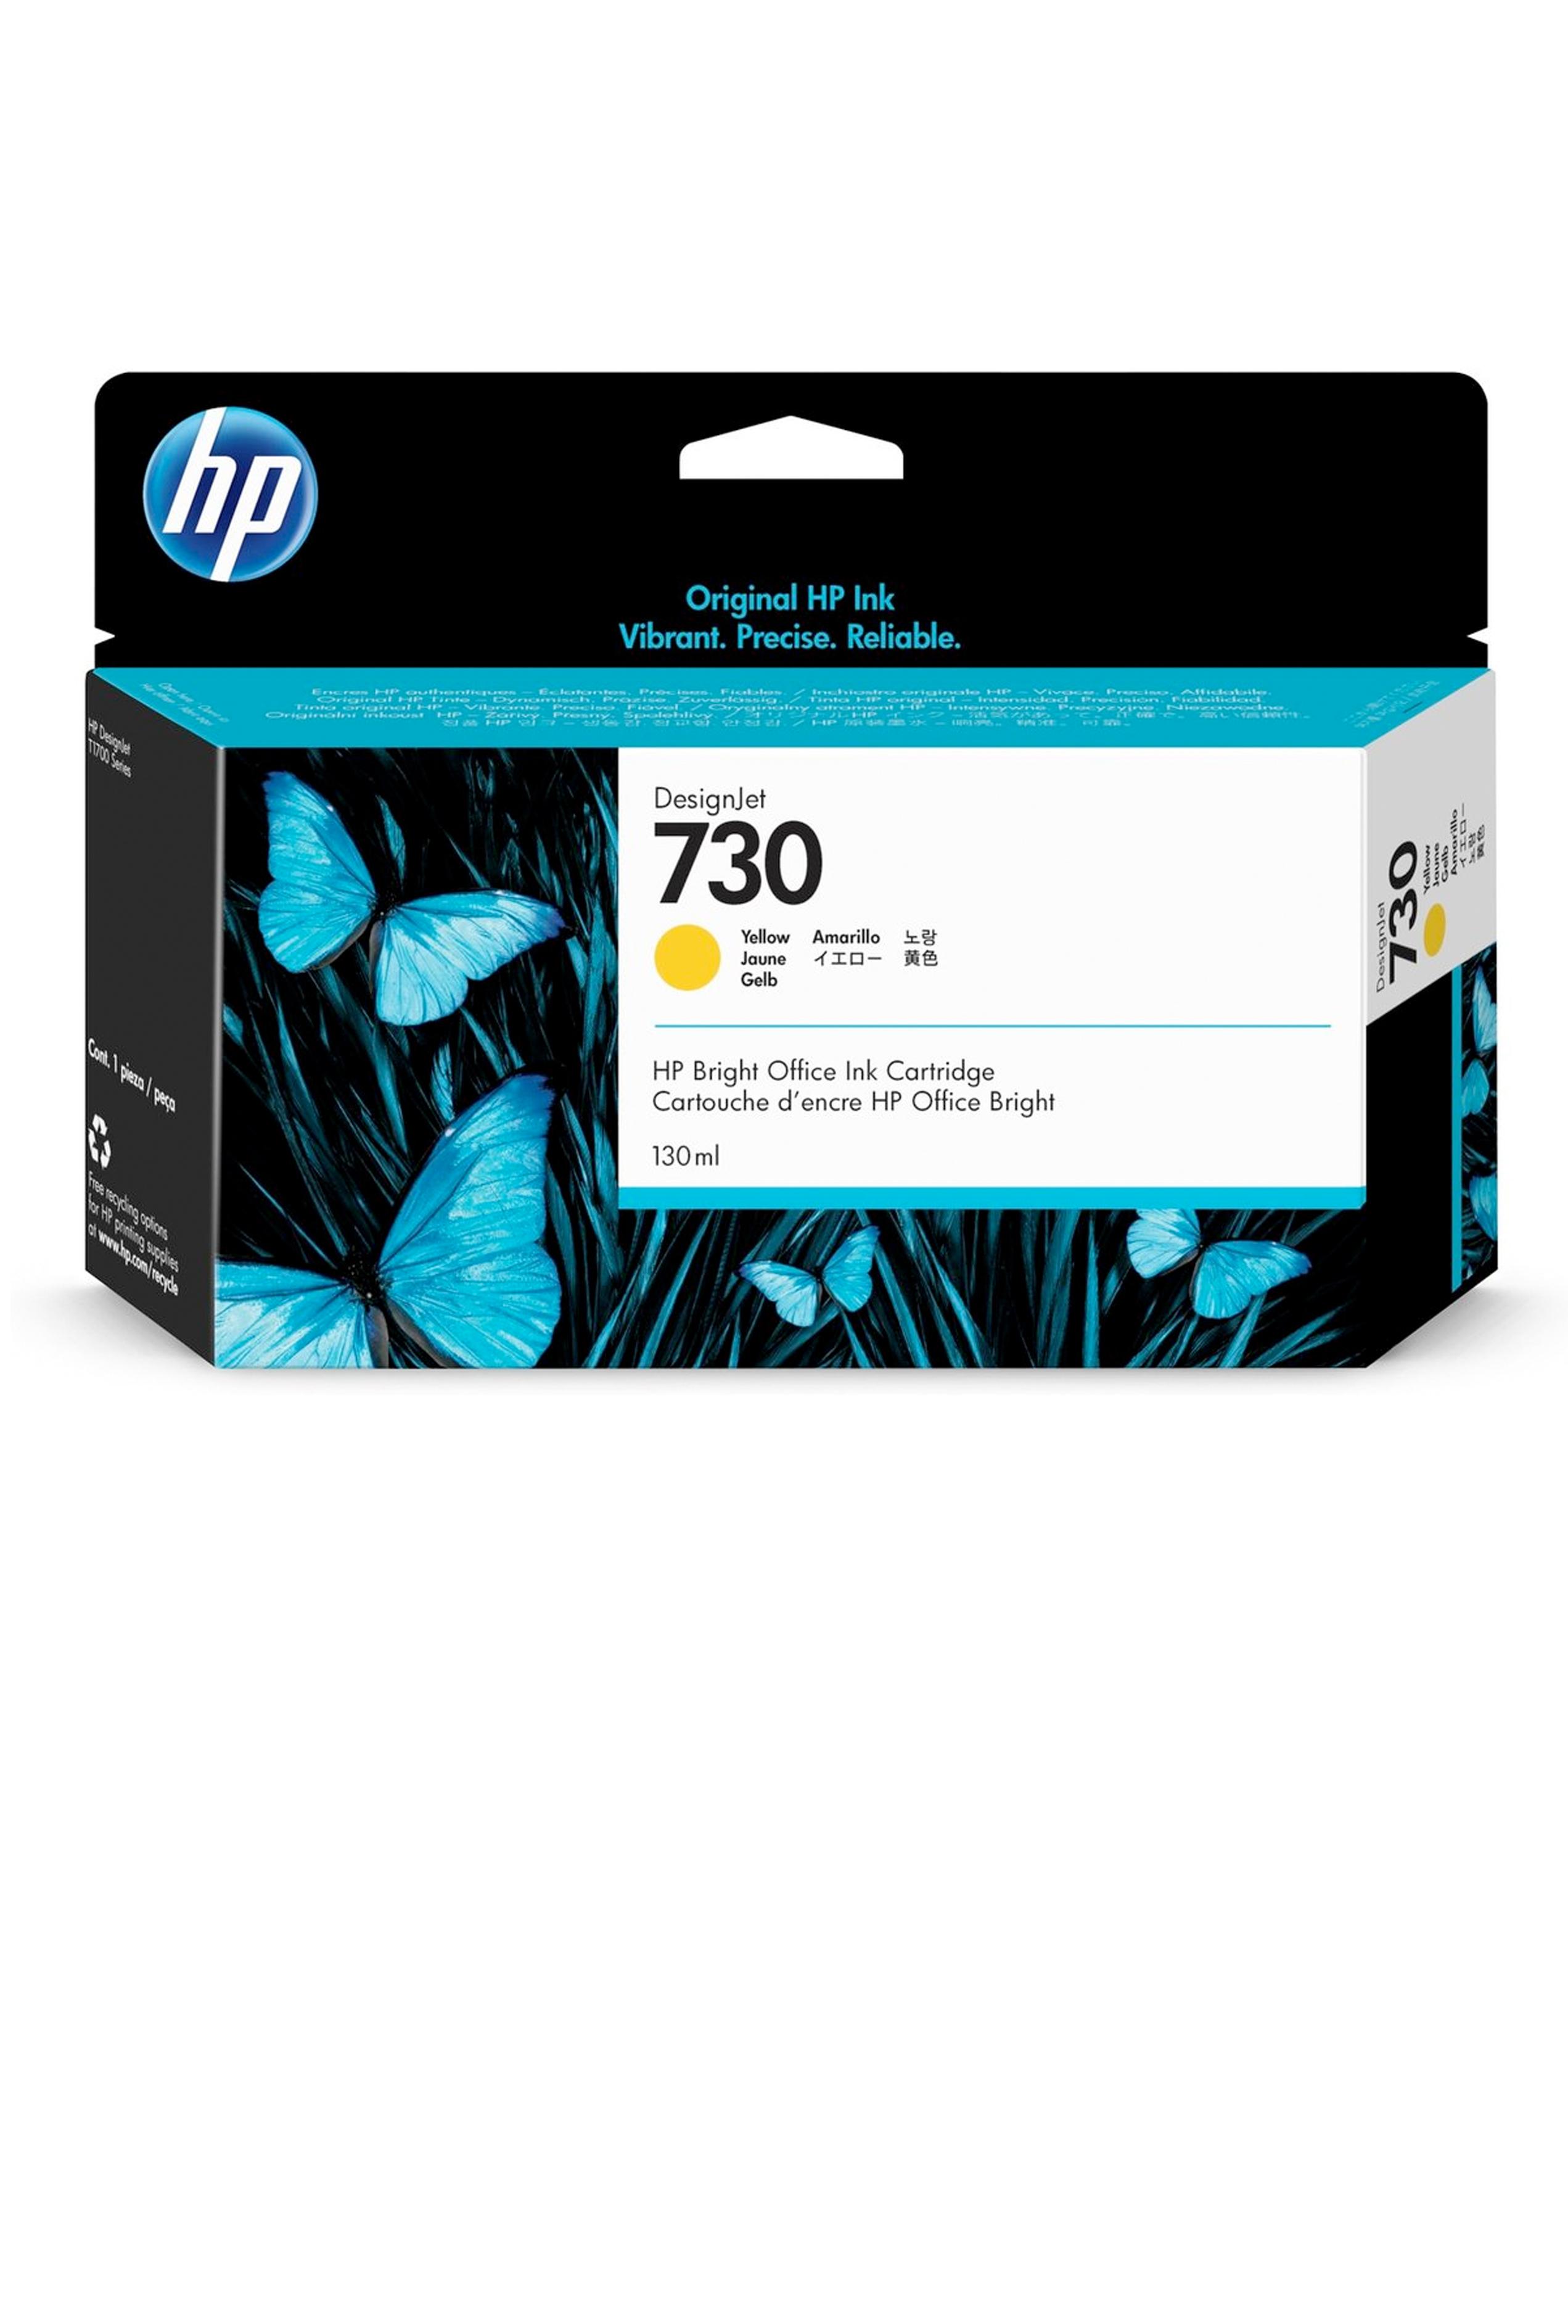 HP 730 DESIGNJET YELLOW INK CARTRIDGE (130mil) (P2V64A)